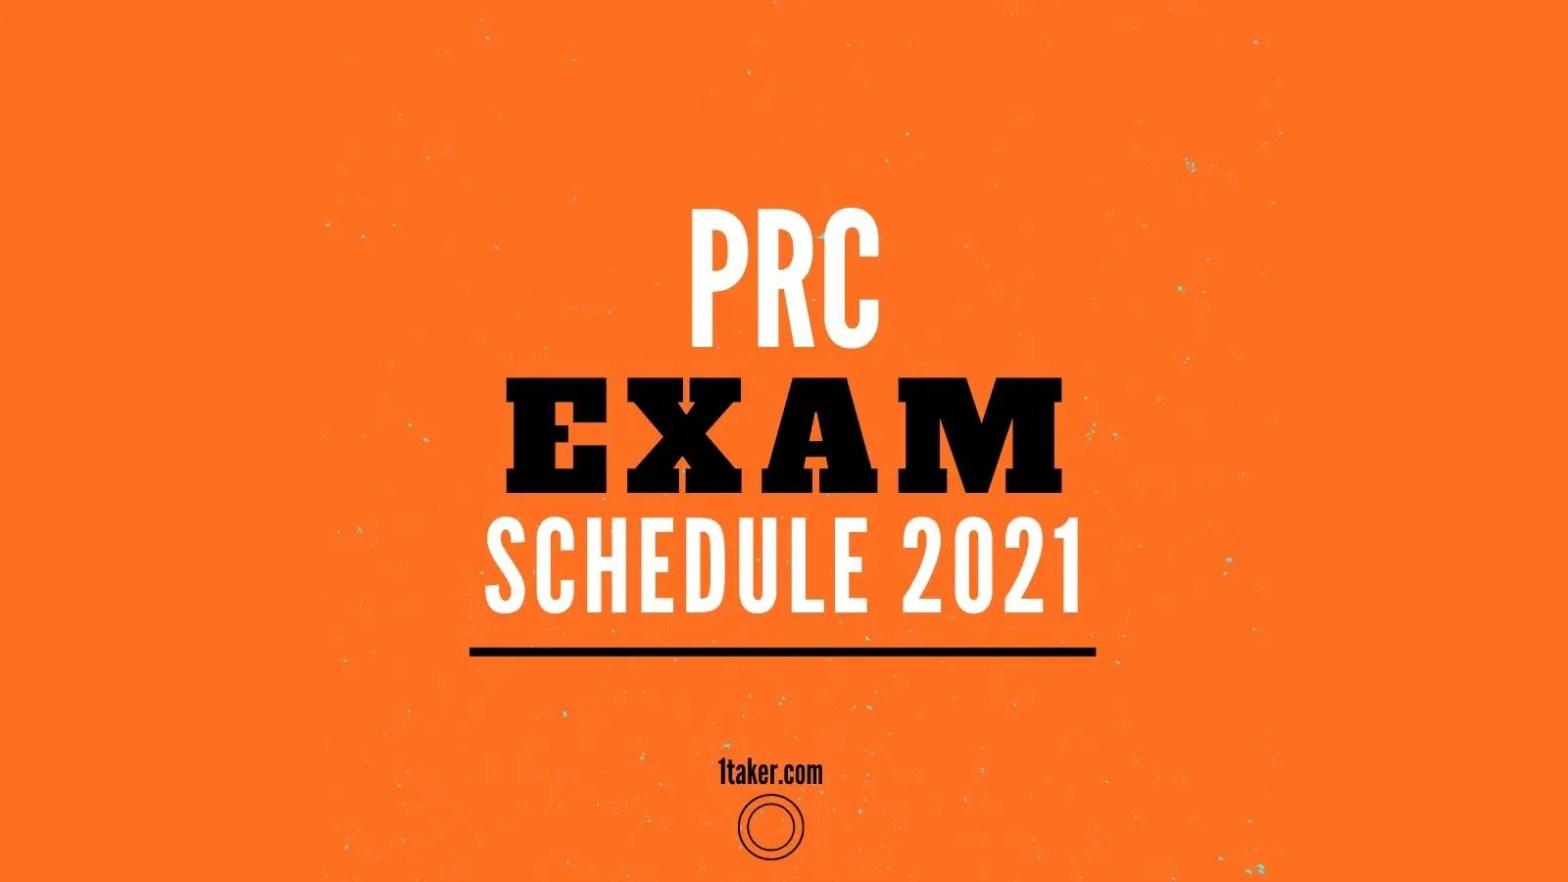 prc exams schedule 2021